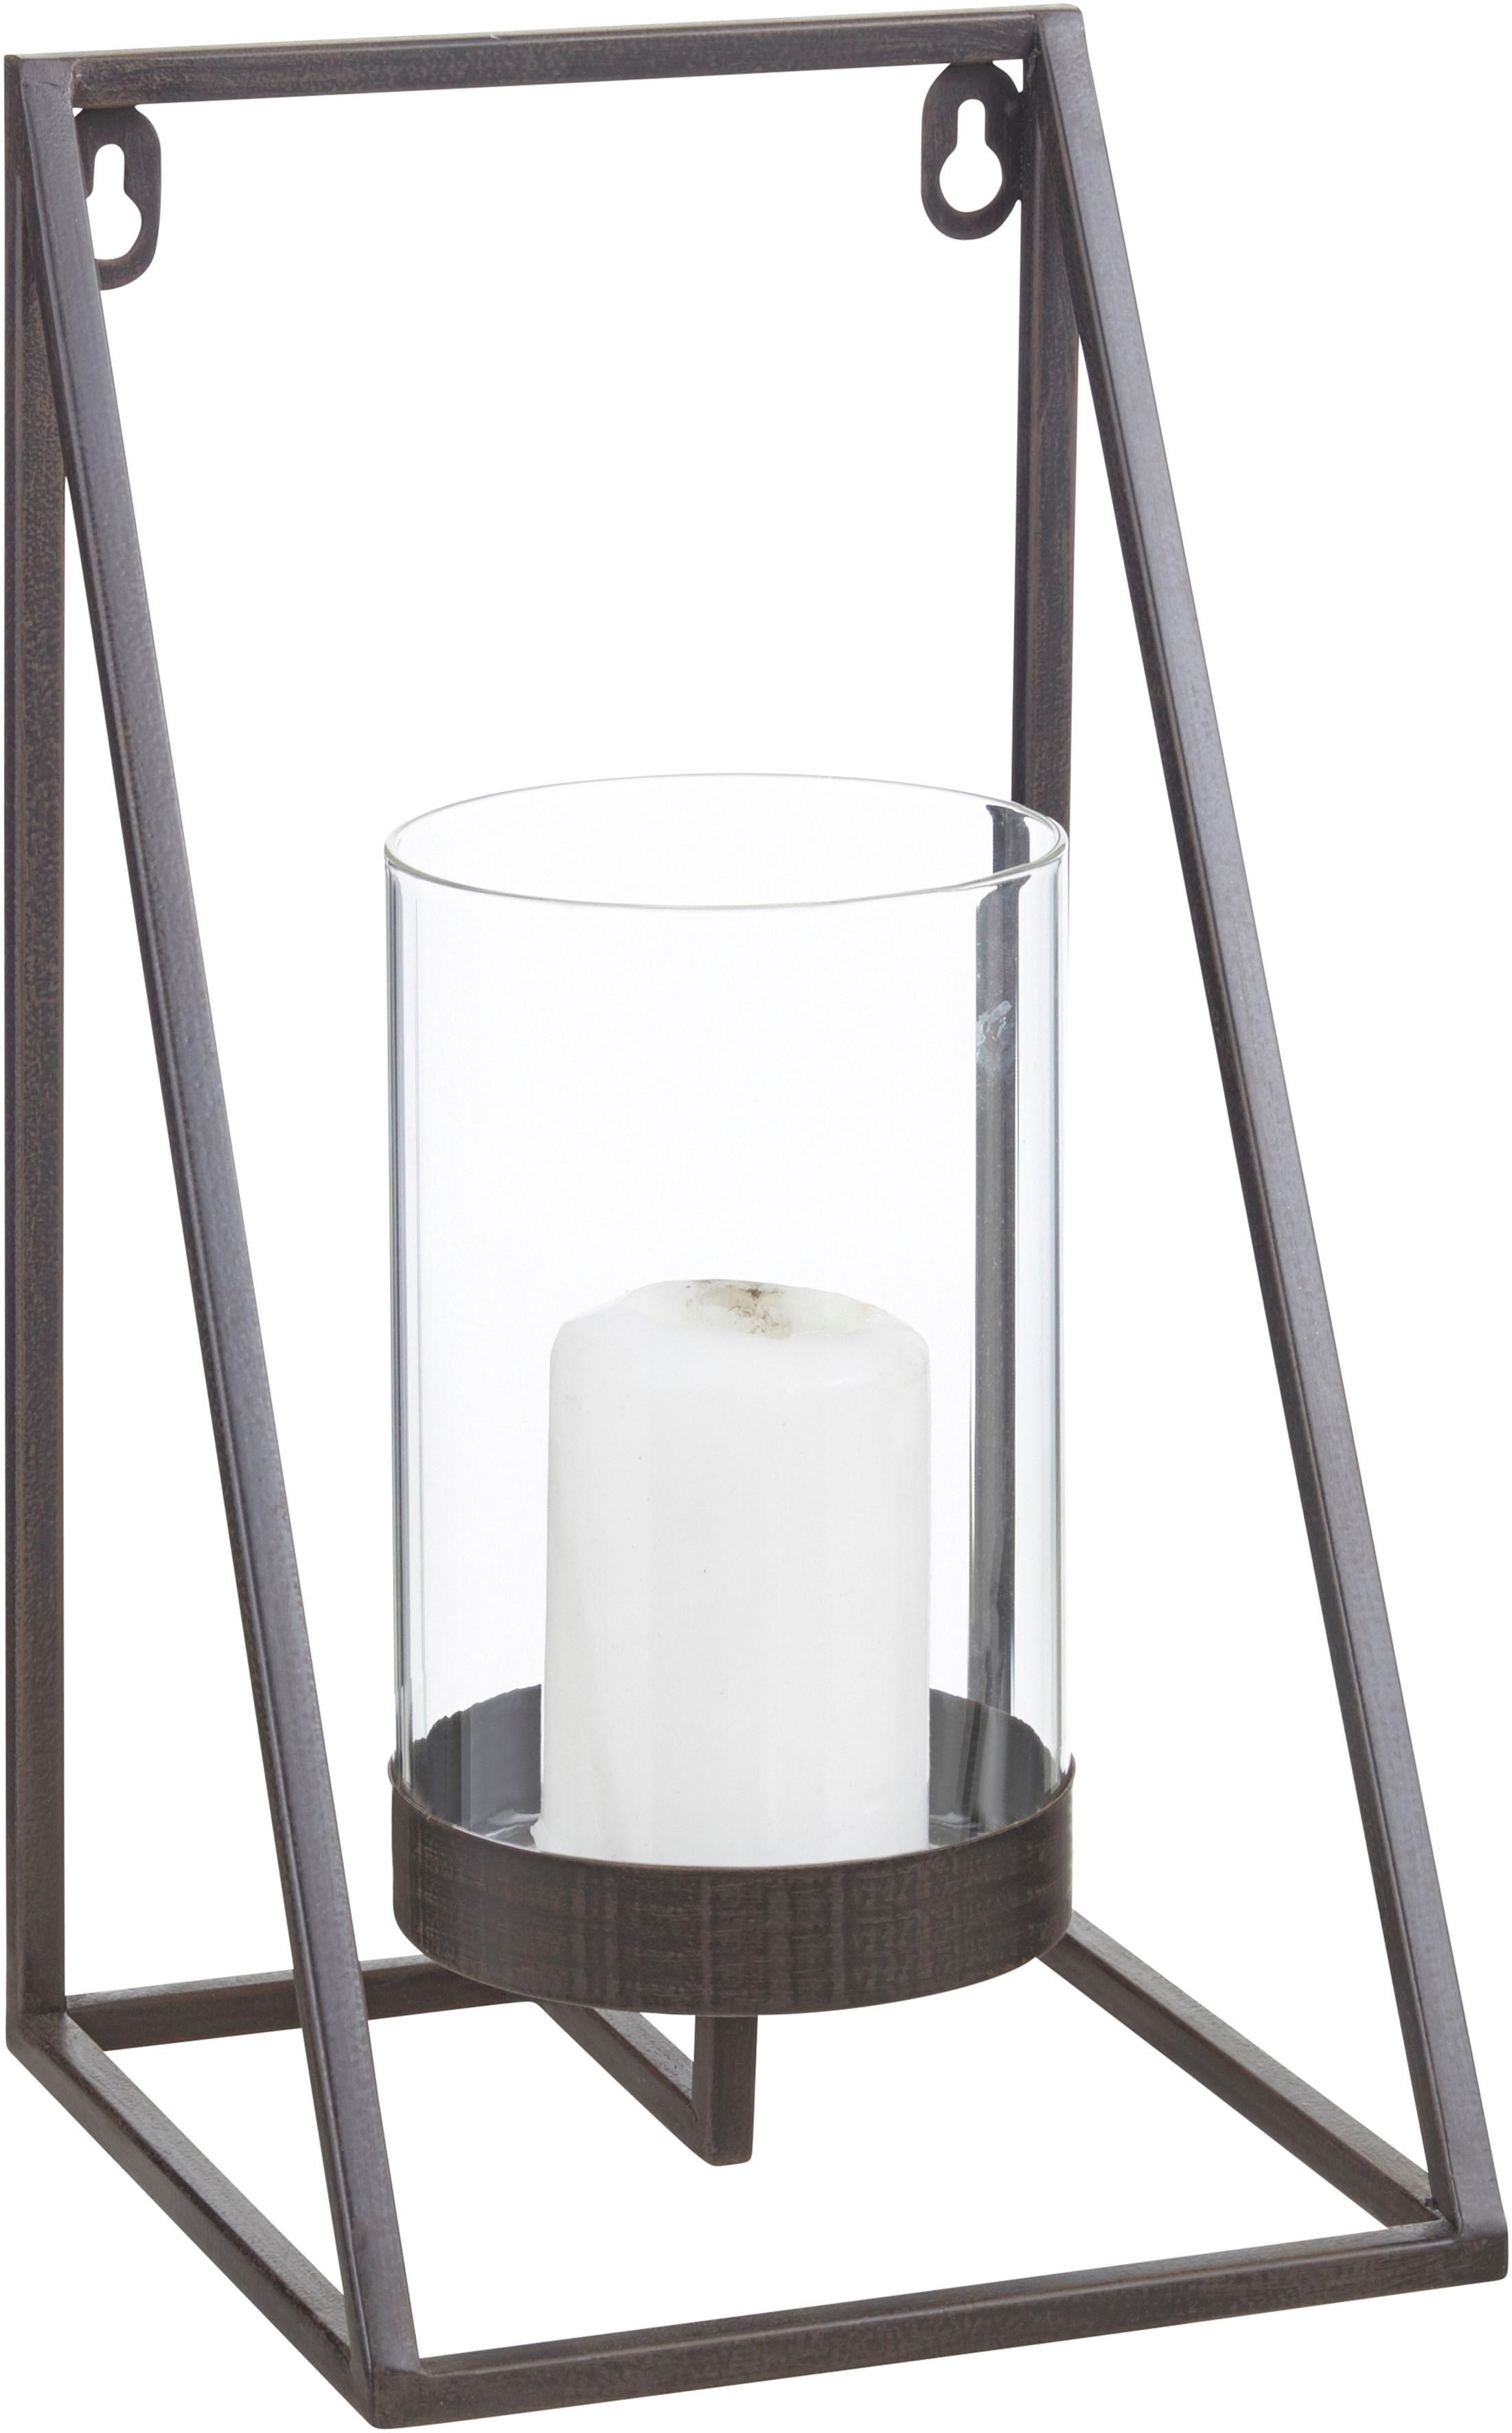 andas Wandkerzenhalter Industrial Candleholder, Kerzen-Wandleuchter, Kerzenhalter, Kerzenleuchter hängend, Wanddeko, aus Metall schwarz Wanddekoration Deko Wohnaccessoires